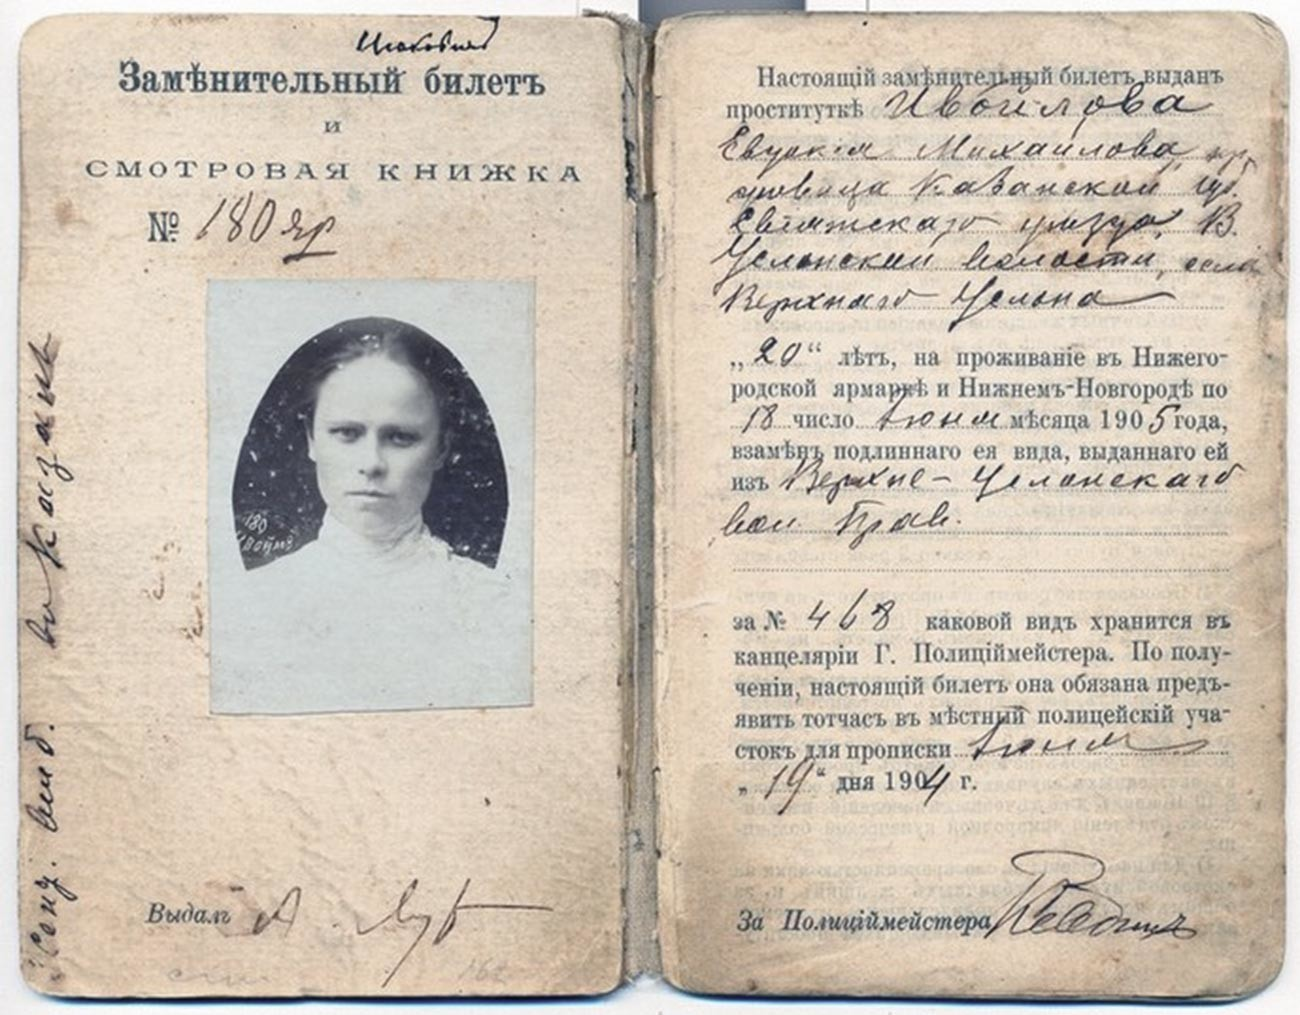 Certificat d'une prostituée de la foire de Nijni Novgorod 1904-1905